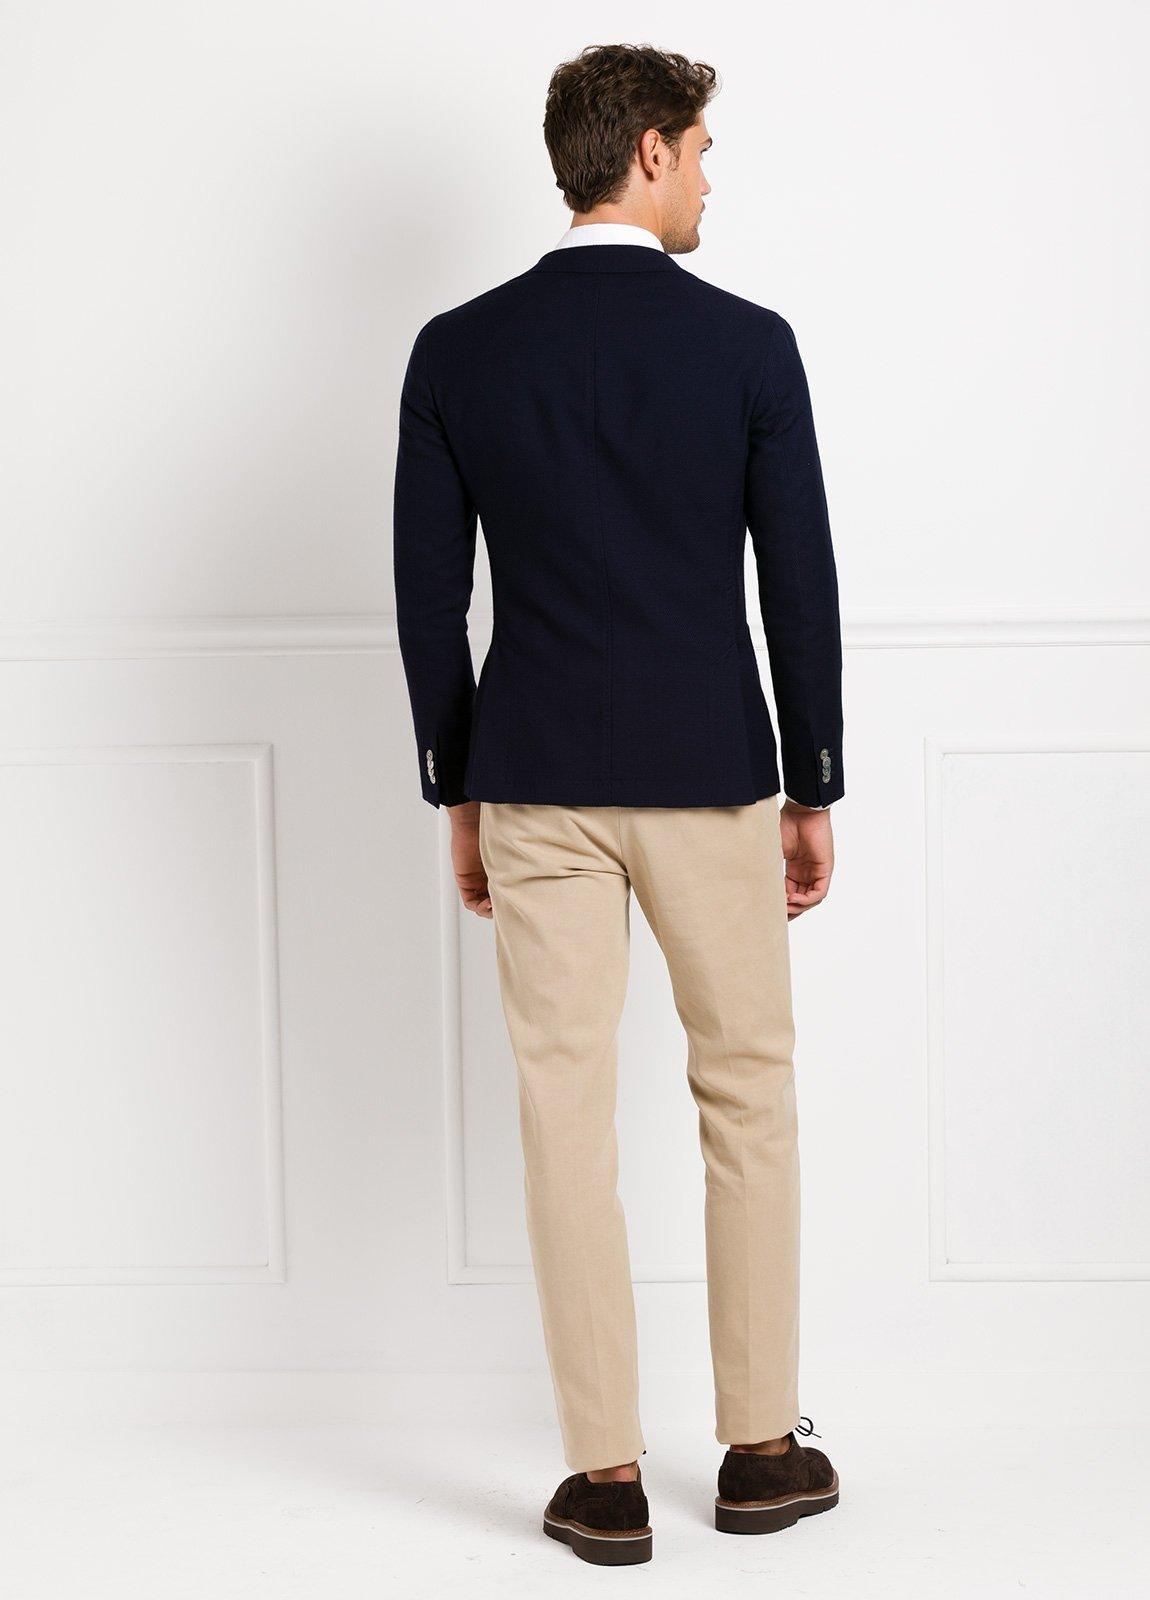 Americana SOFT JACKET Slim Fit textura color azul marino, 100% Lana fria. - Ítem4